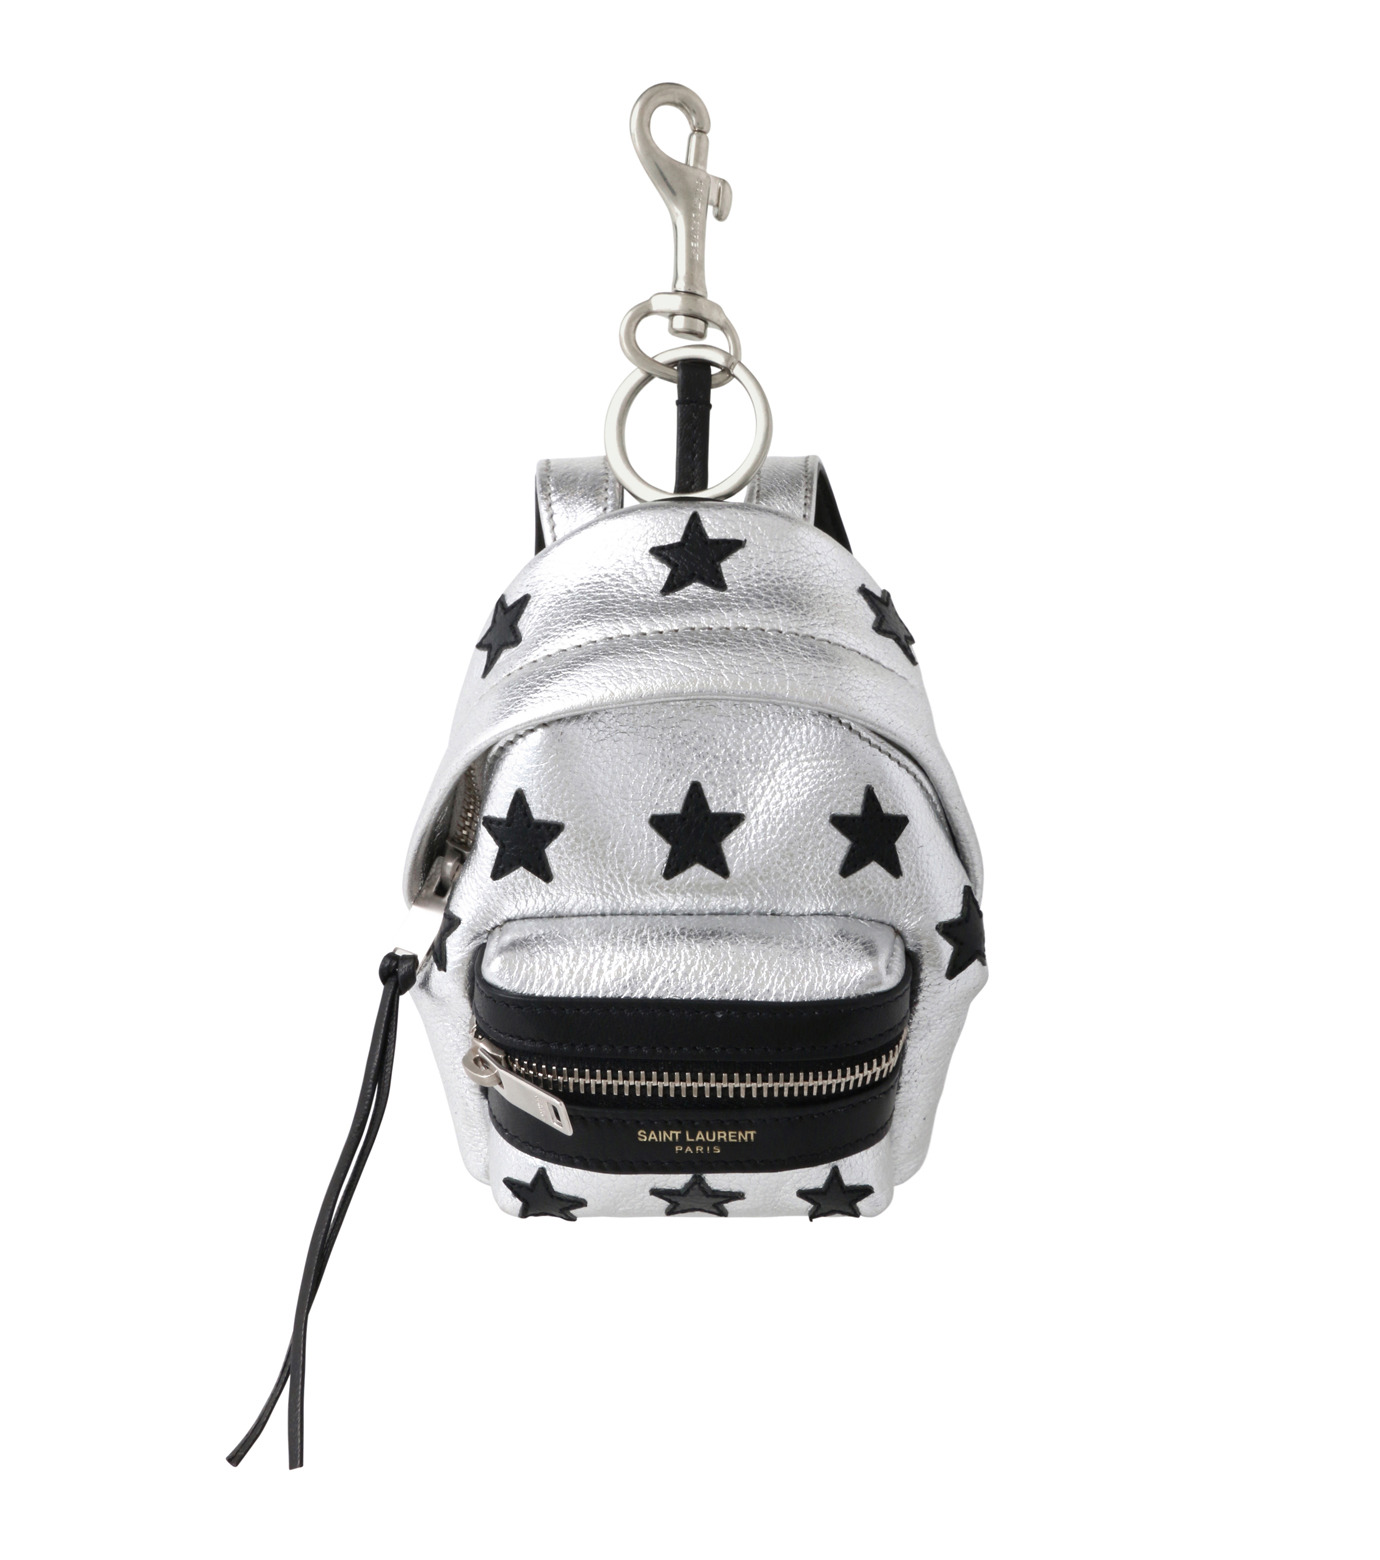 SAINT LAURENT(サンローラン)のSilver Star Mini-SILVER-441914-BSZA6-1 拡大詳細画像1